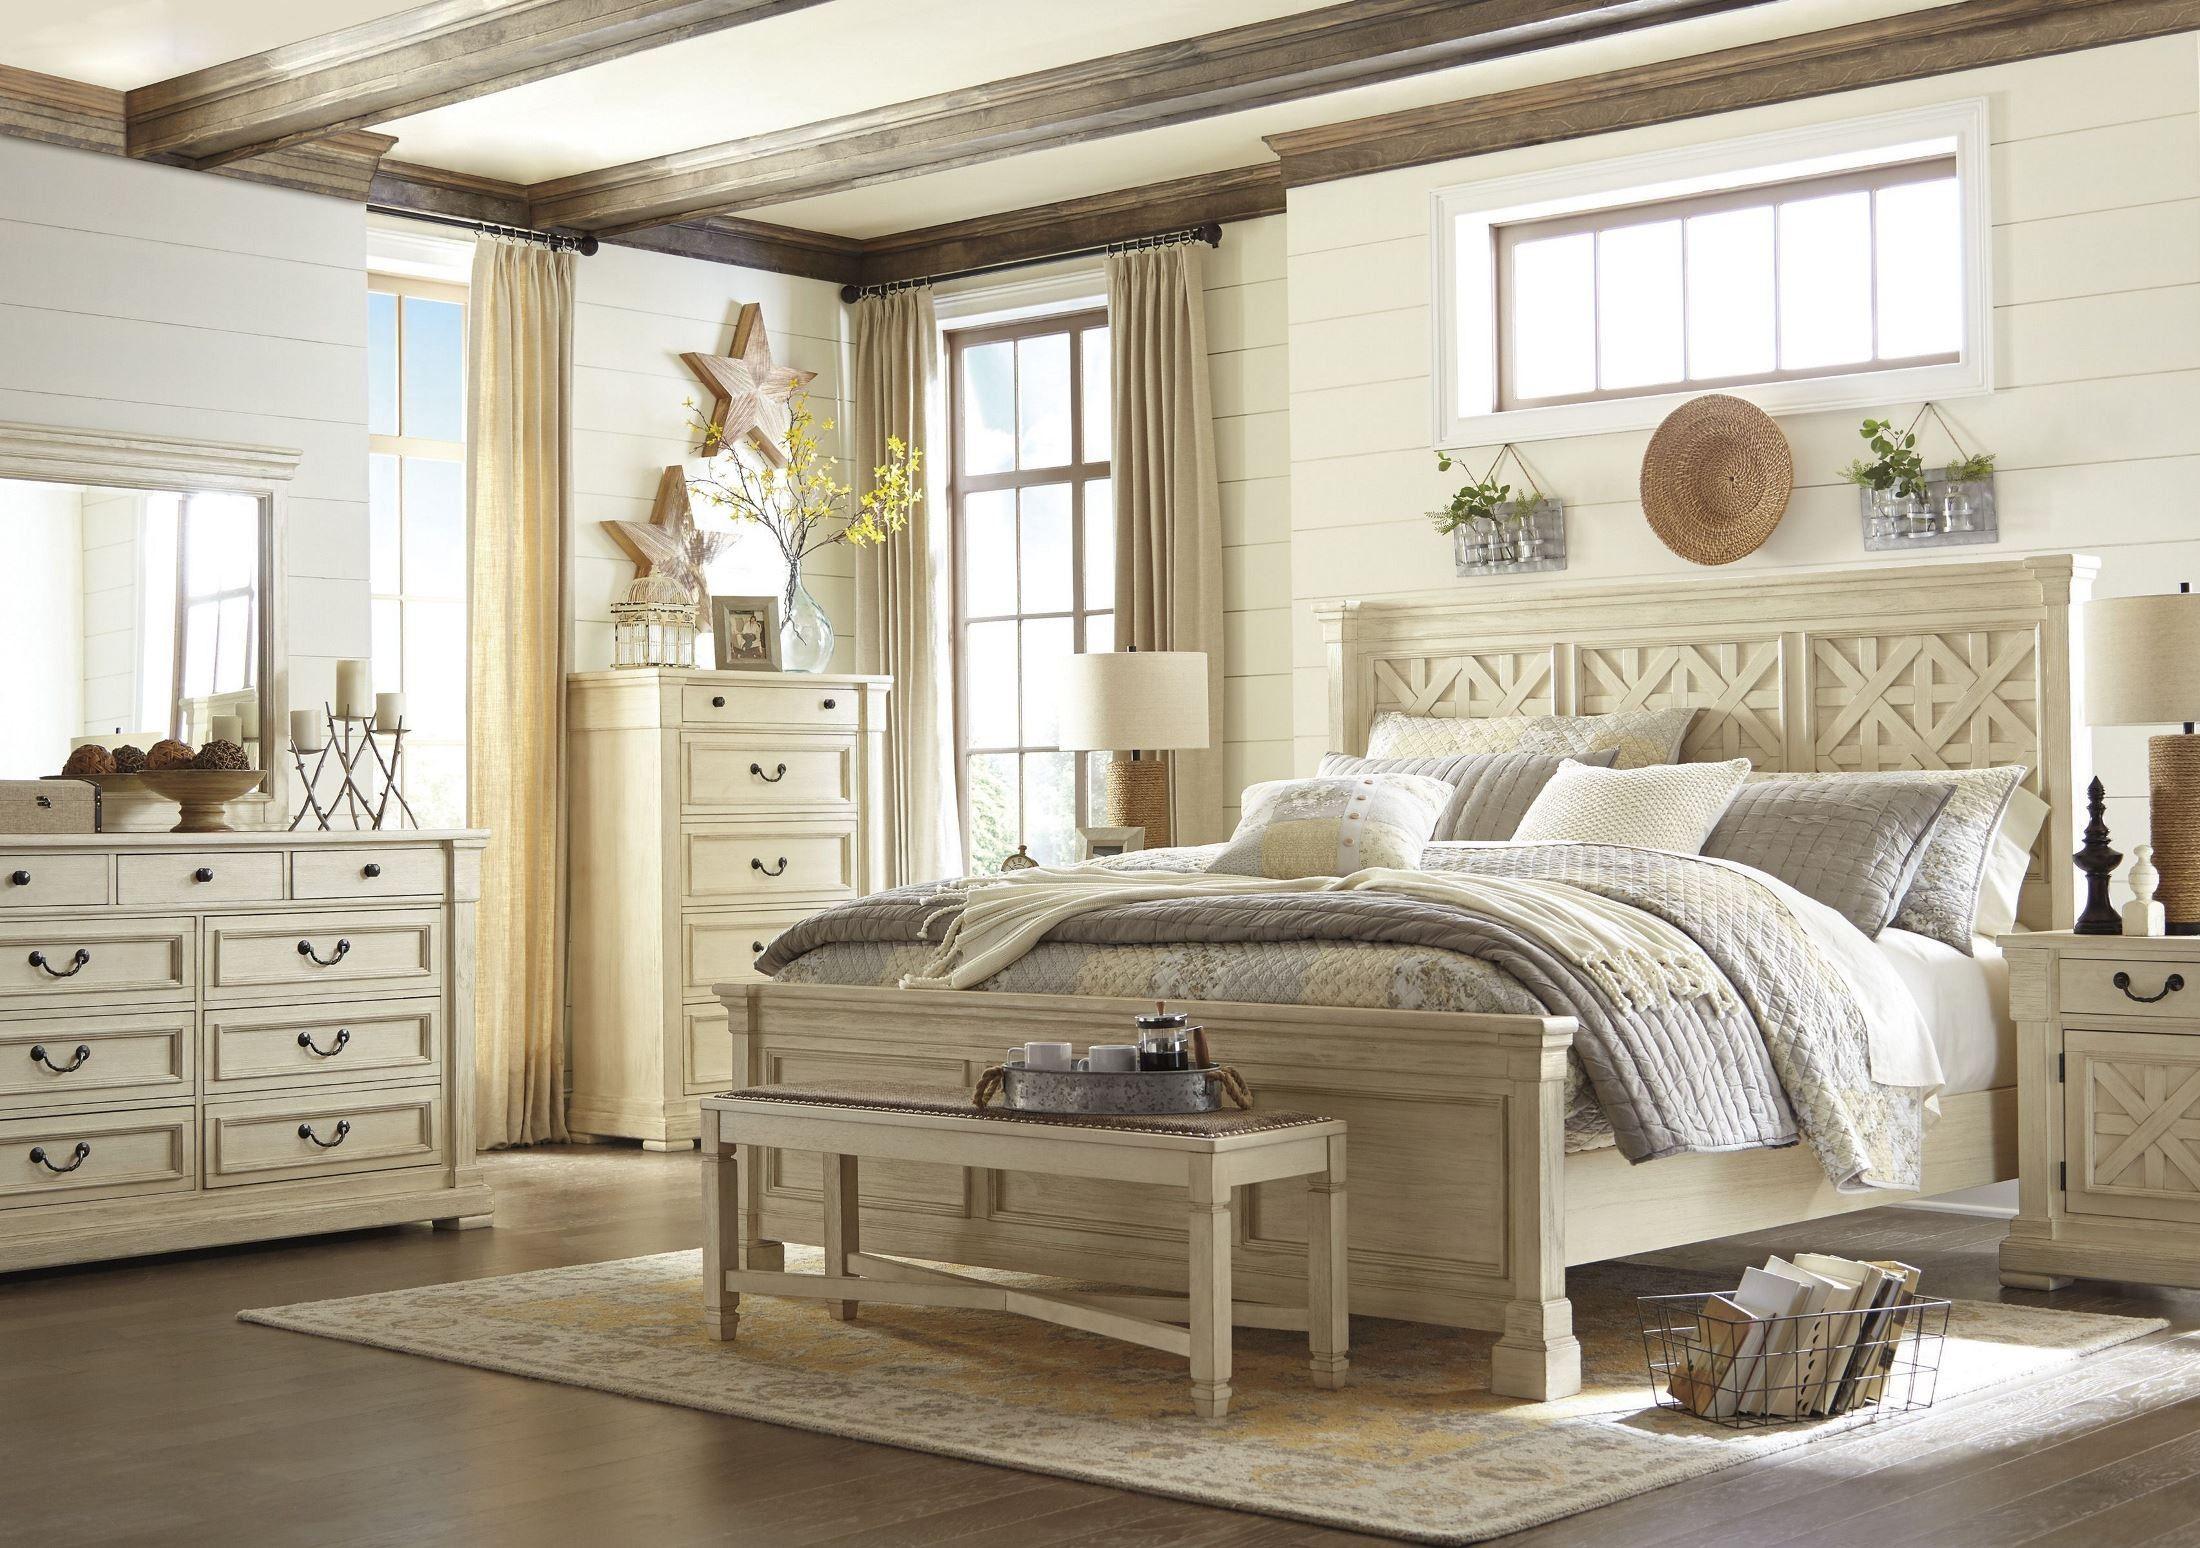 bolanburg white louvered panel bedroom set - Louvered Bedroom Decor